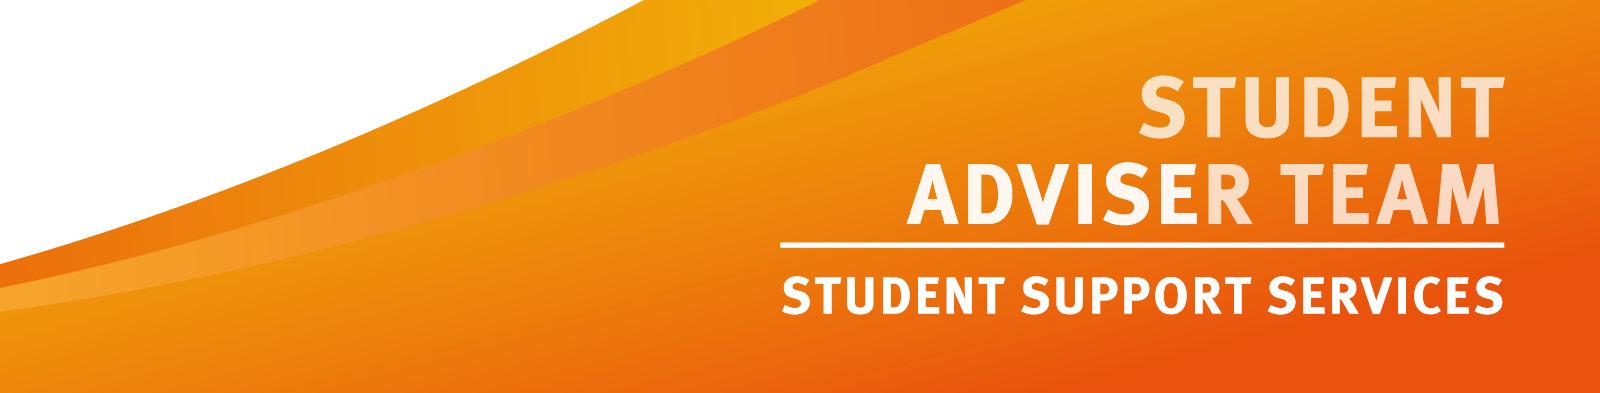 Student Adviser Team - Student Support Services